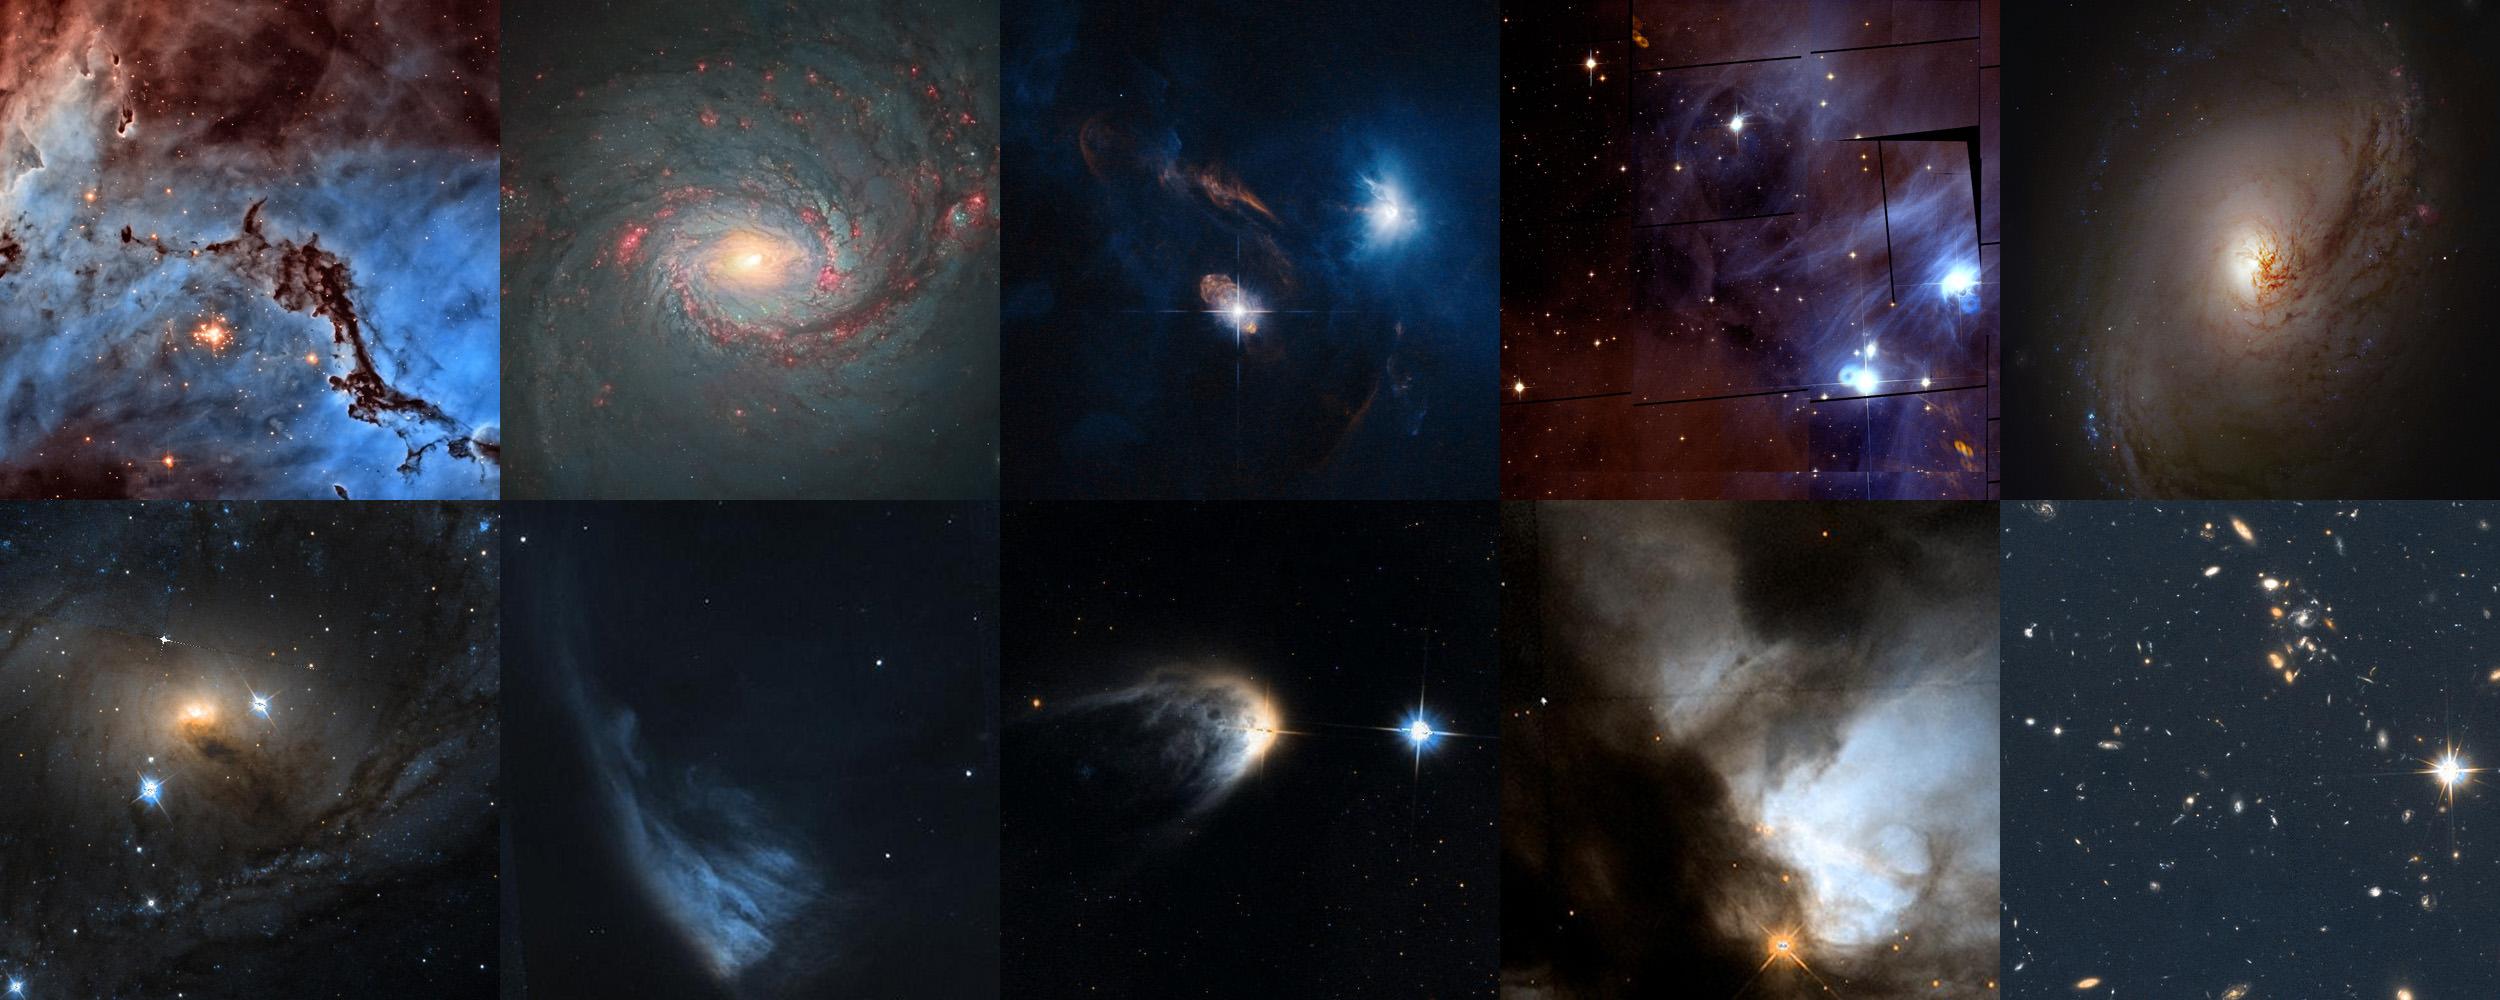 https://i1.wp.com/www.universetoday.com/wp-content/uploads/2012/08/hs-2012-40-a-full_jpg.jpg